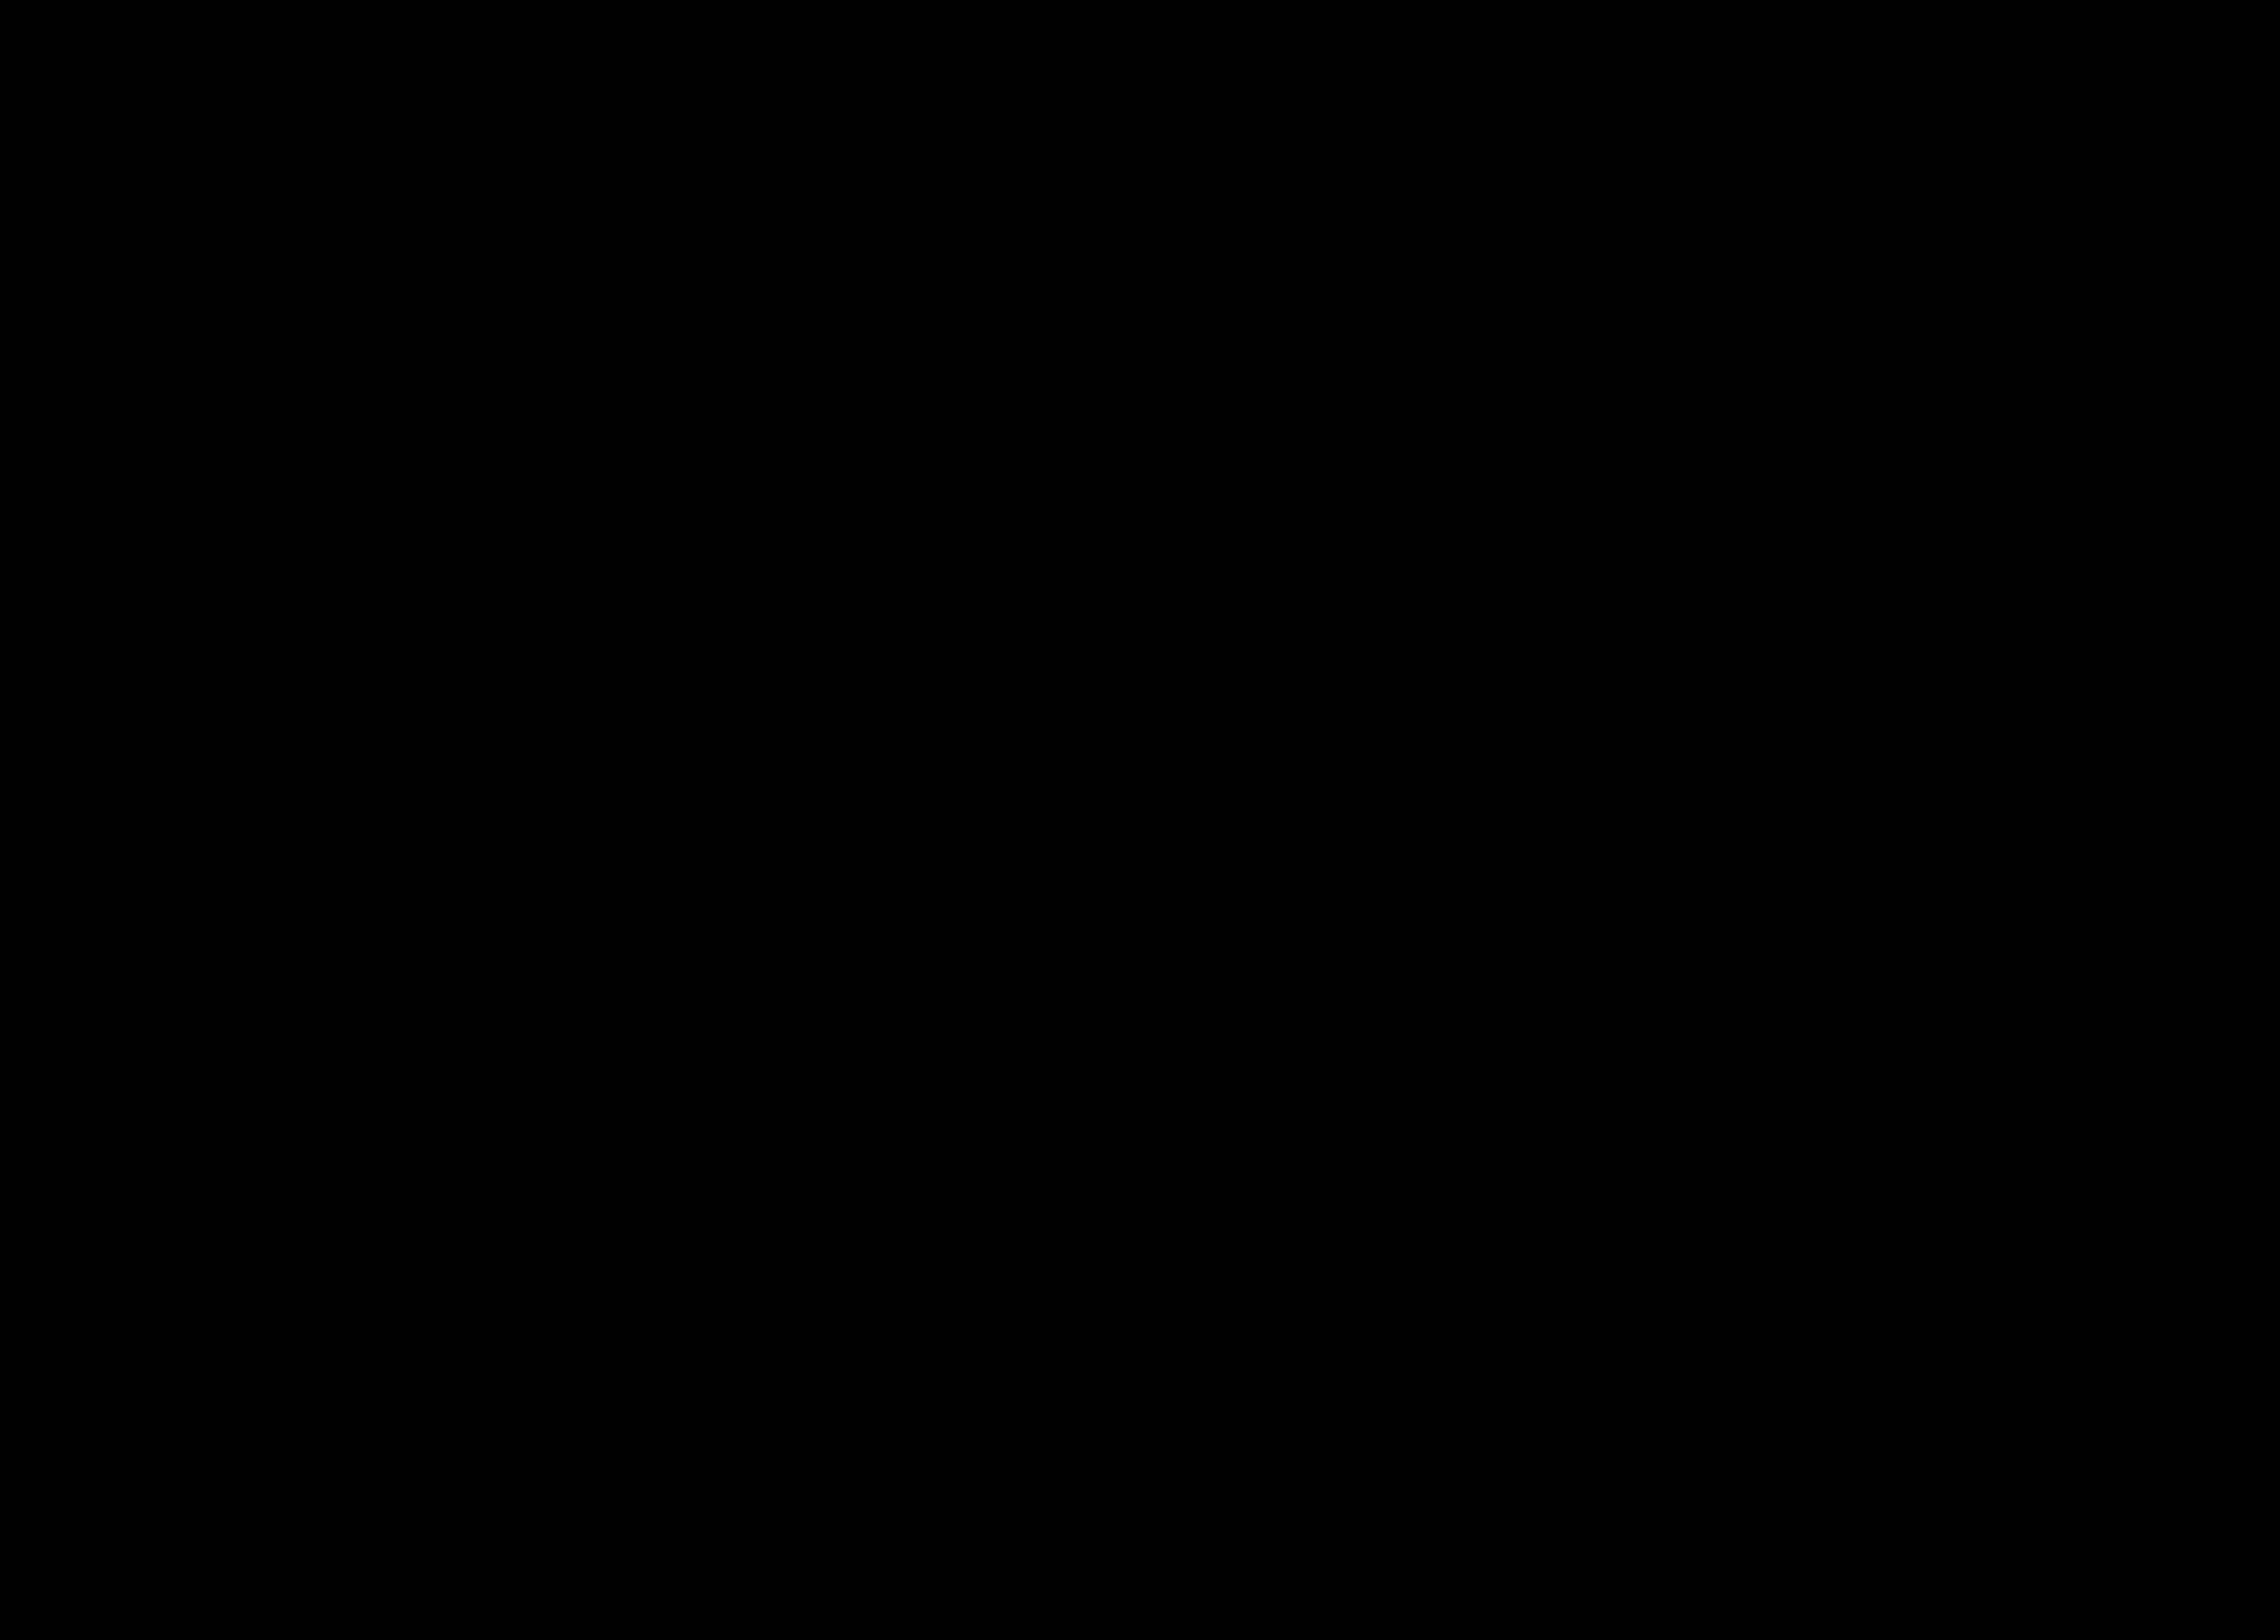 Fantasy Dragon Silhouette by GDJ Dragons in 2019